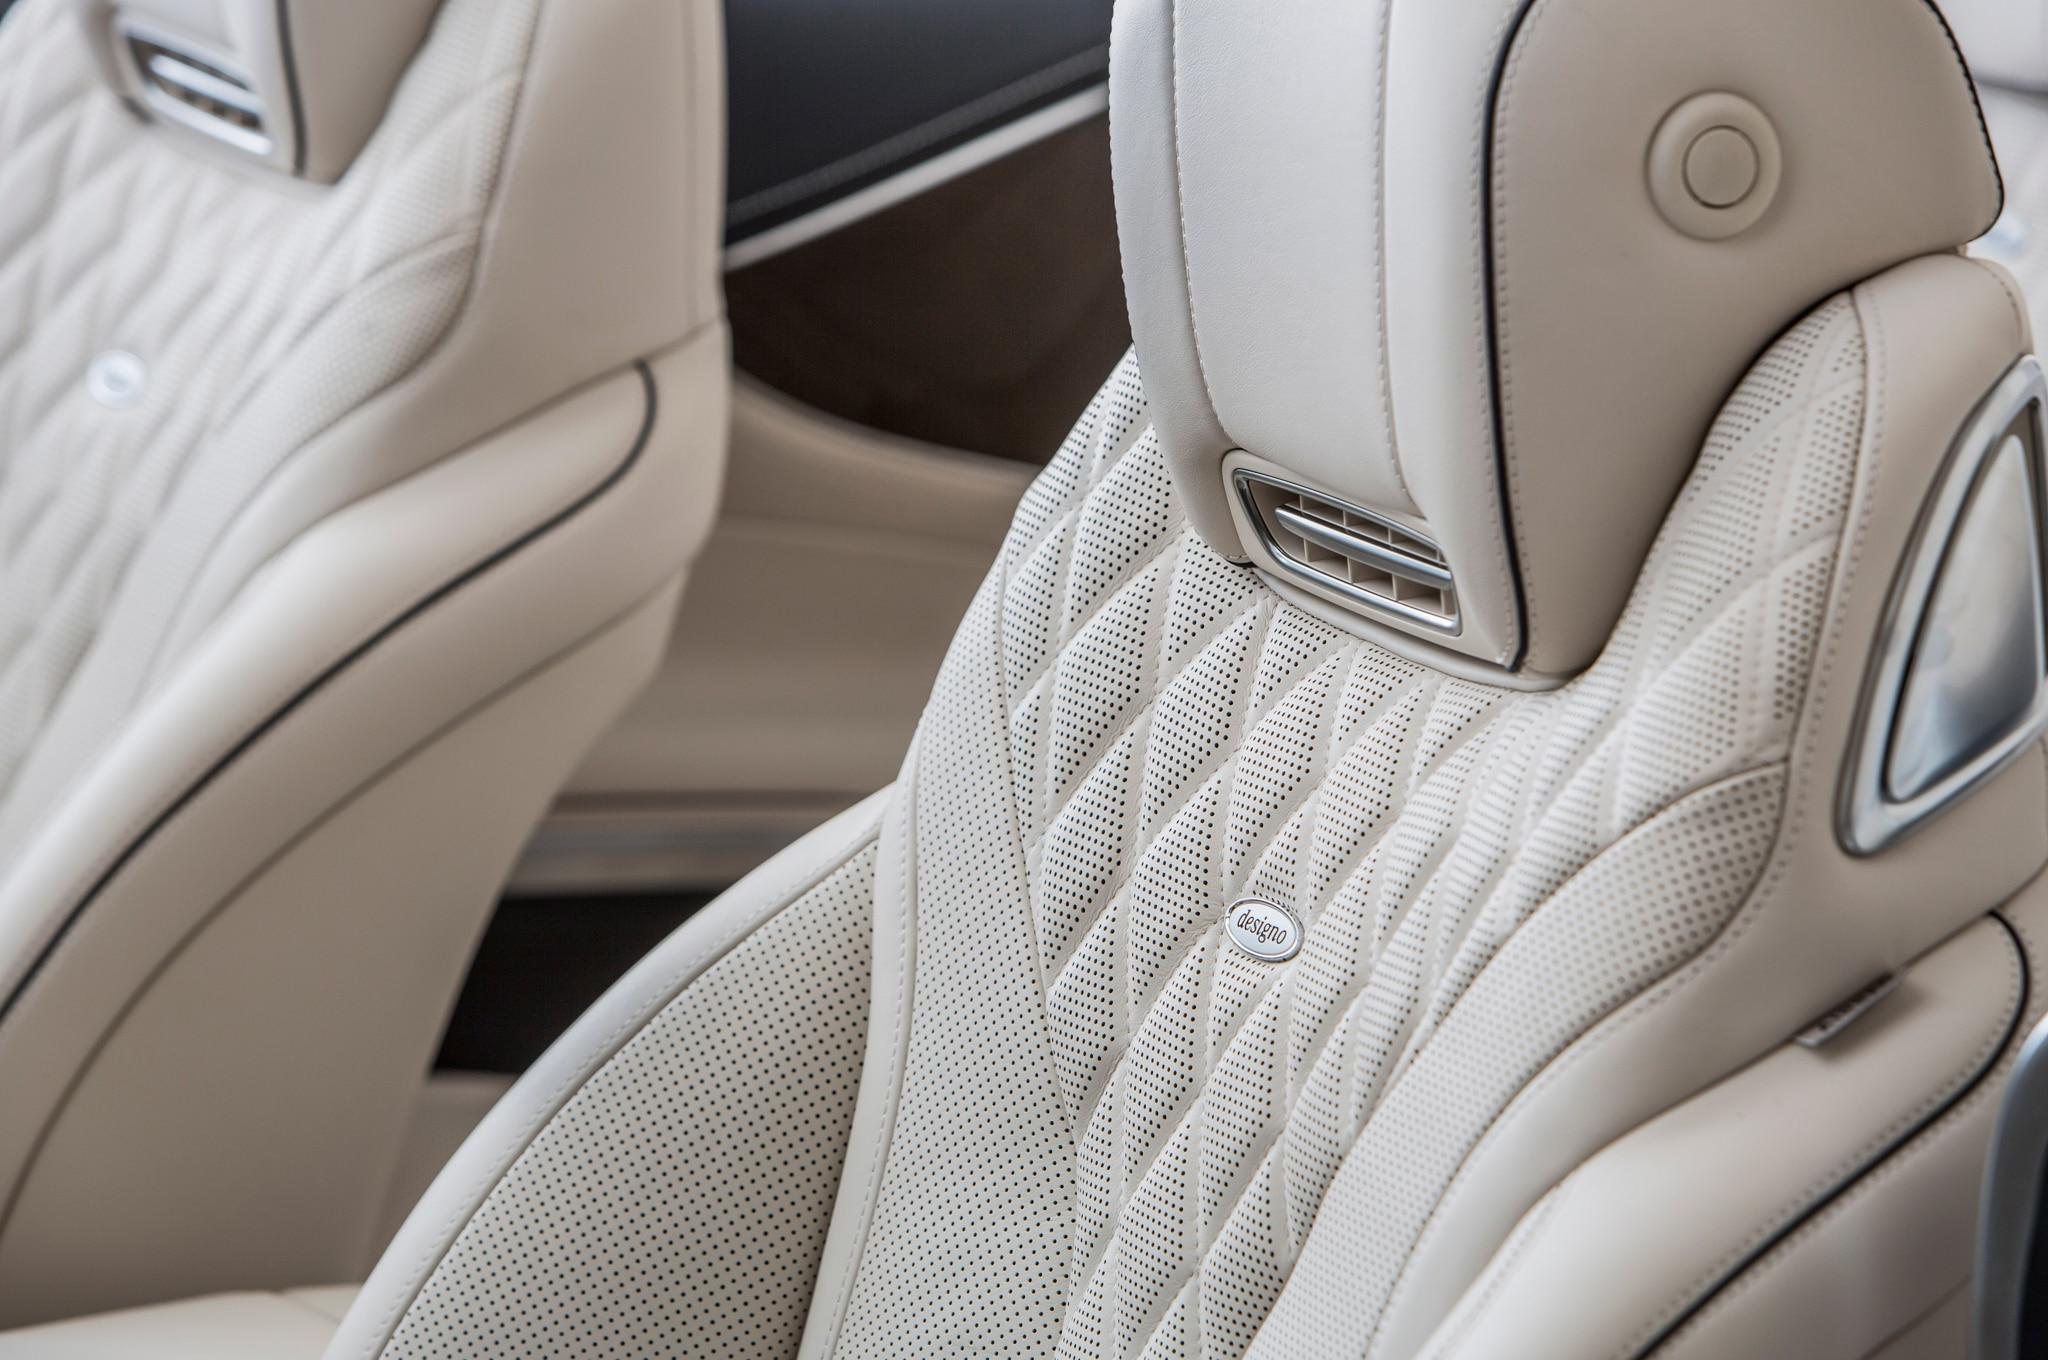 2017 mercedes benz s550 cabriolet interior 02 - Filename 2017 Mercedes Benz S550 Cabriolet Interior Seats Jpg